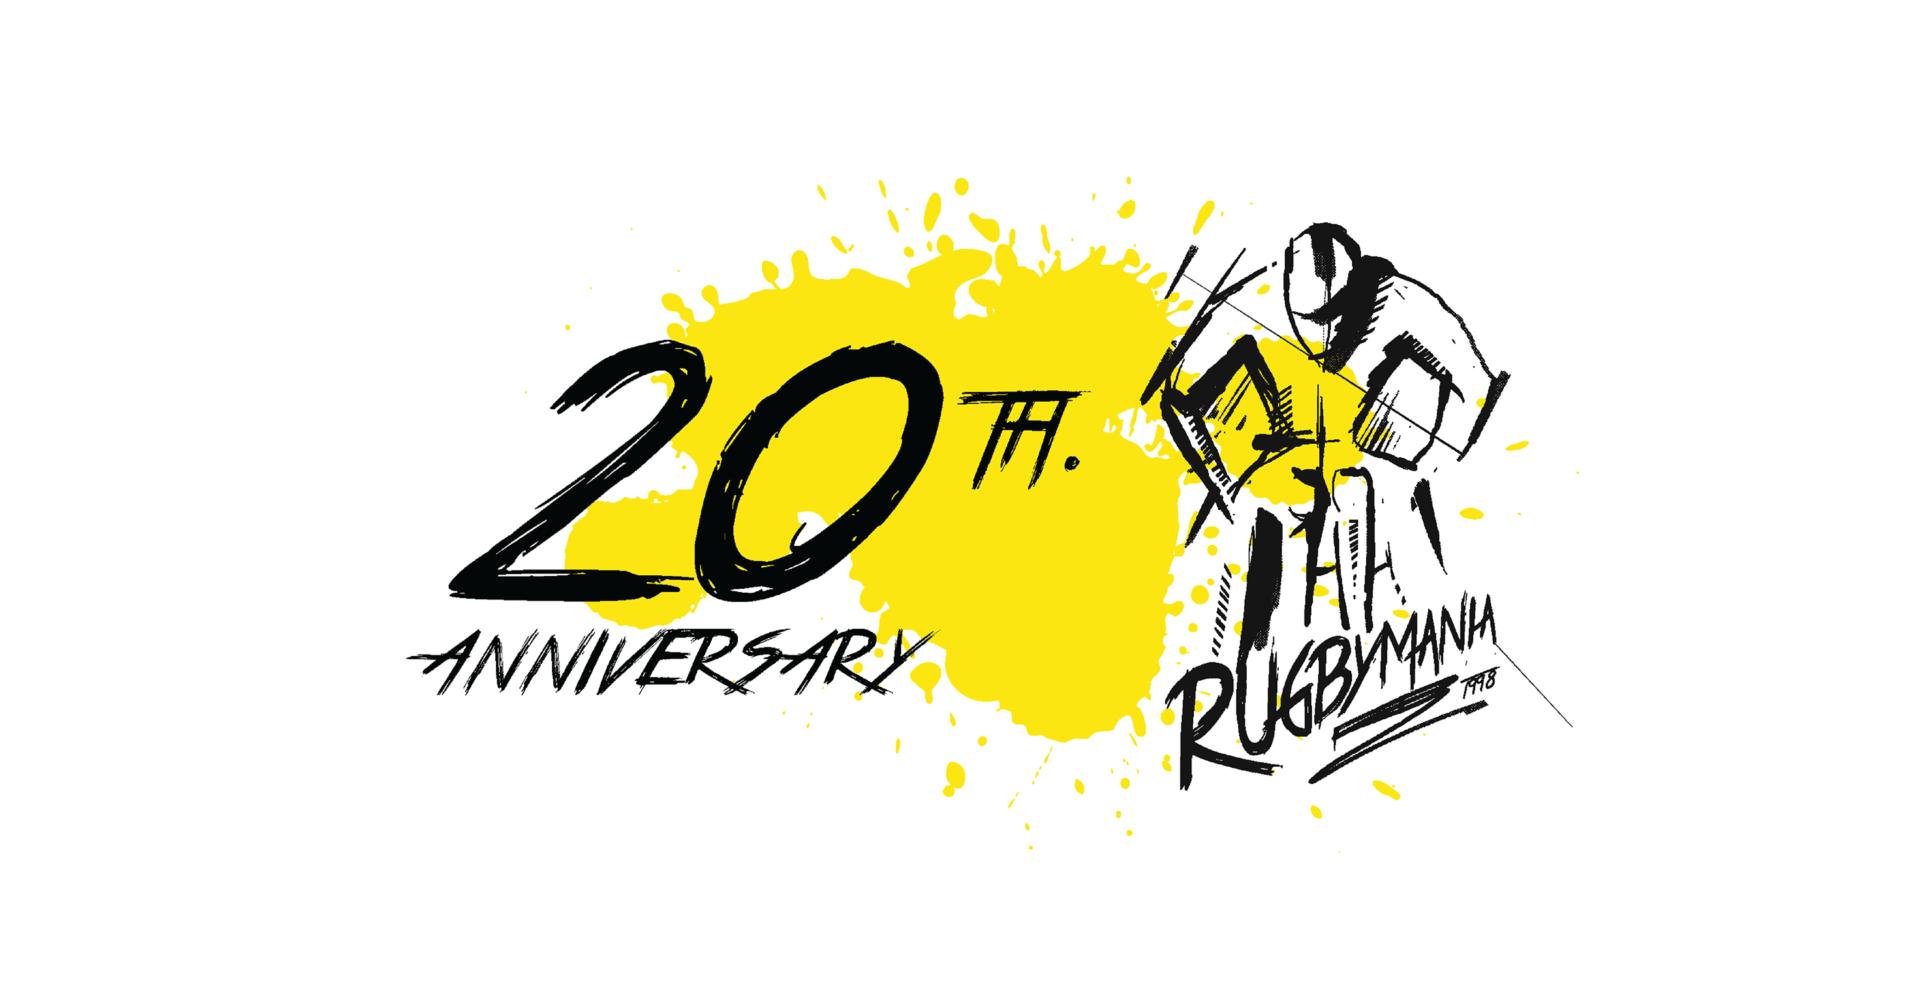 Rugbymania 2018: Day 3 Recap